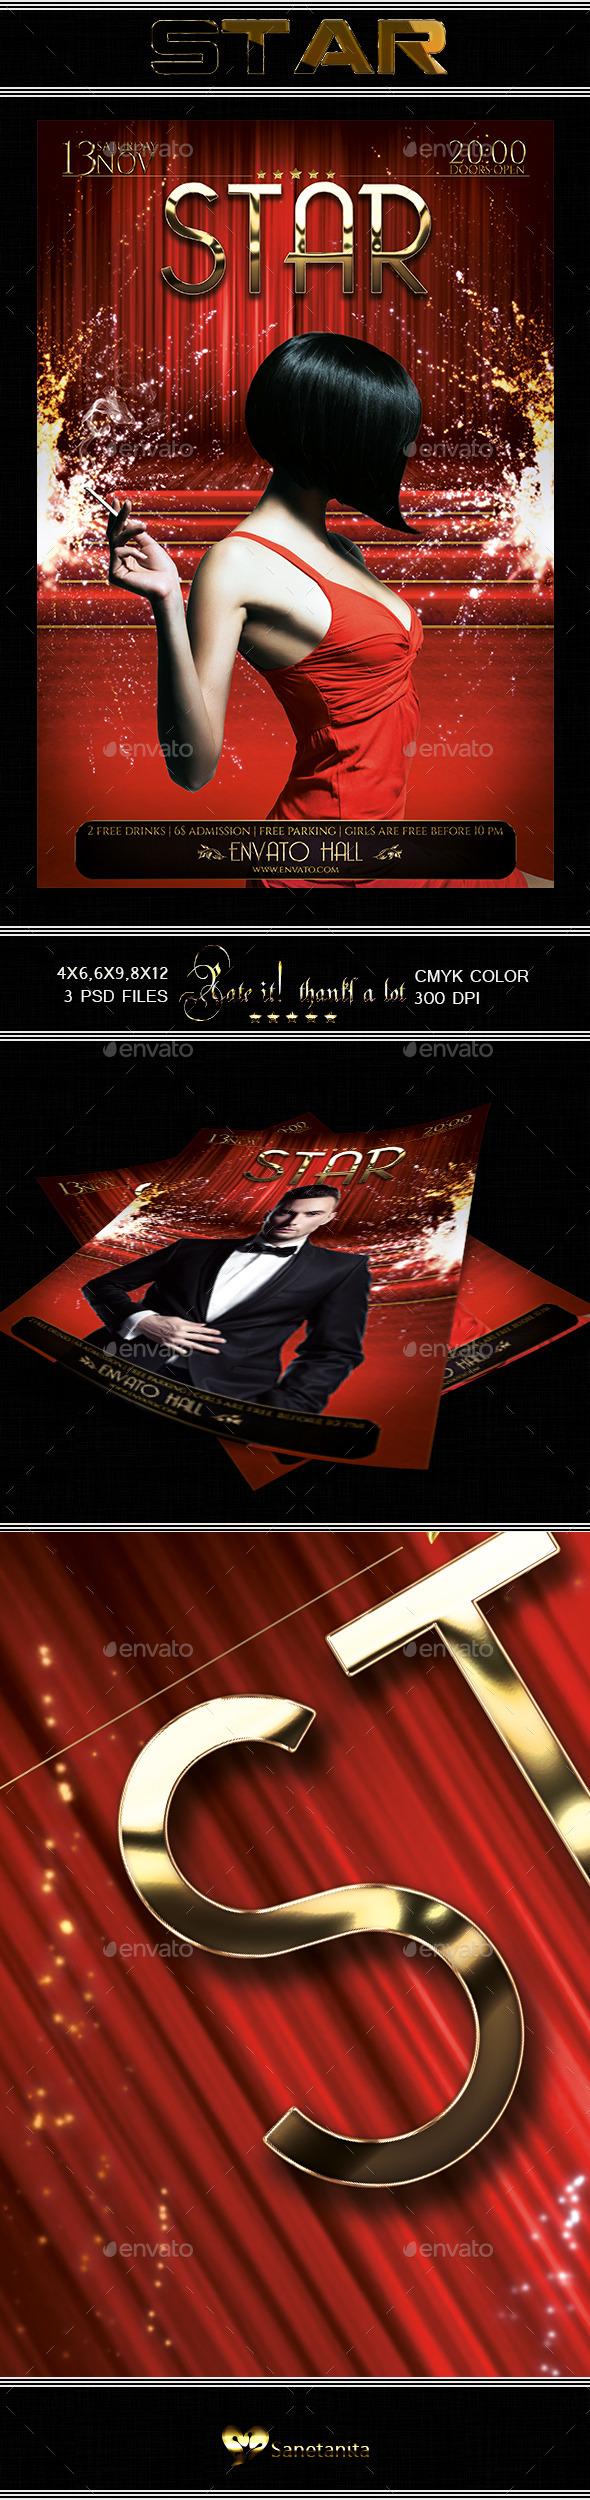 Red Carpet Flyer - Concerts Events